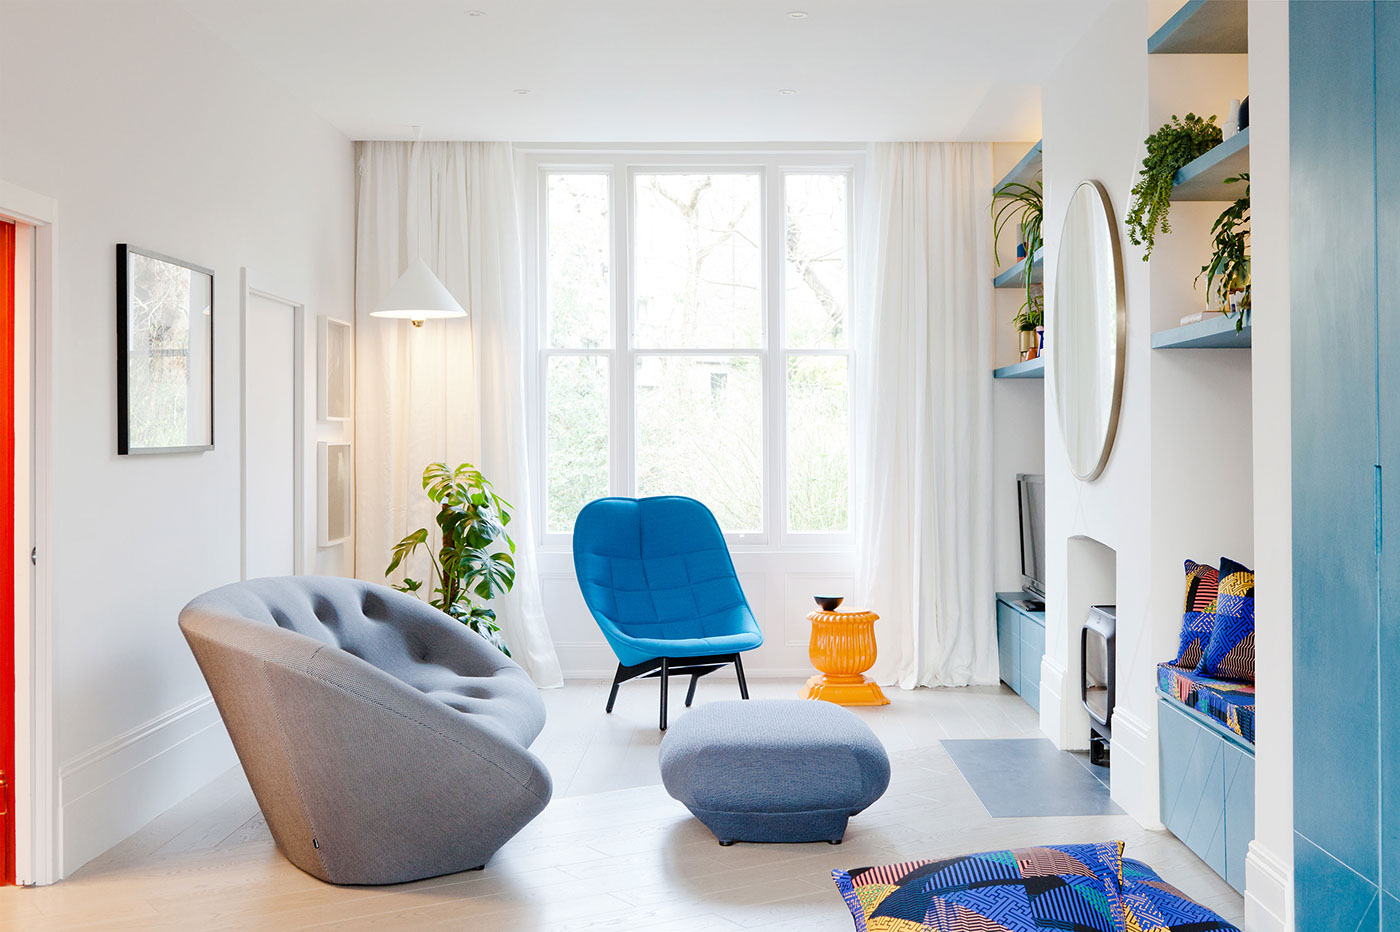 Idee per rimodernare casa